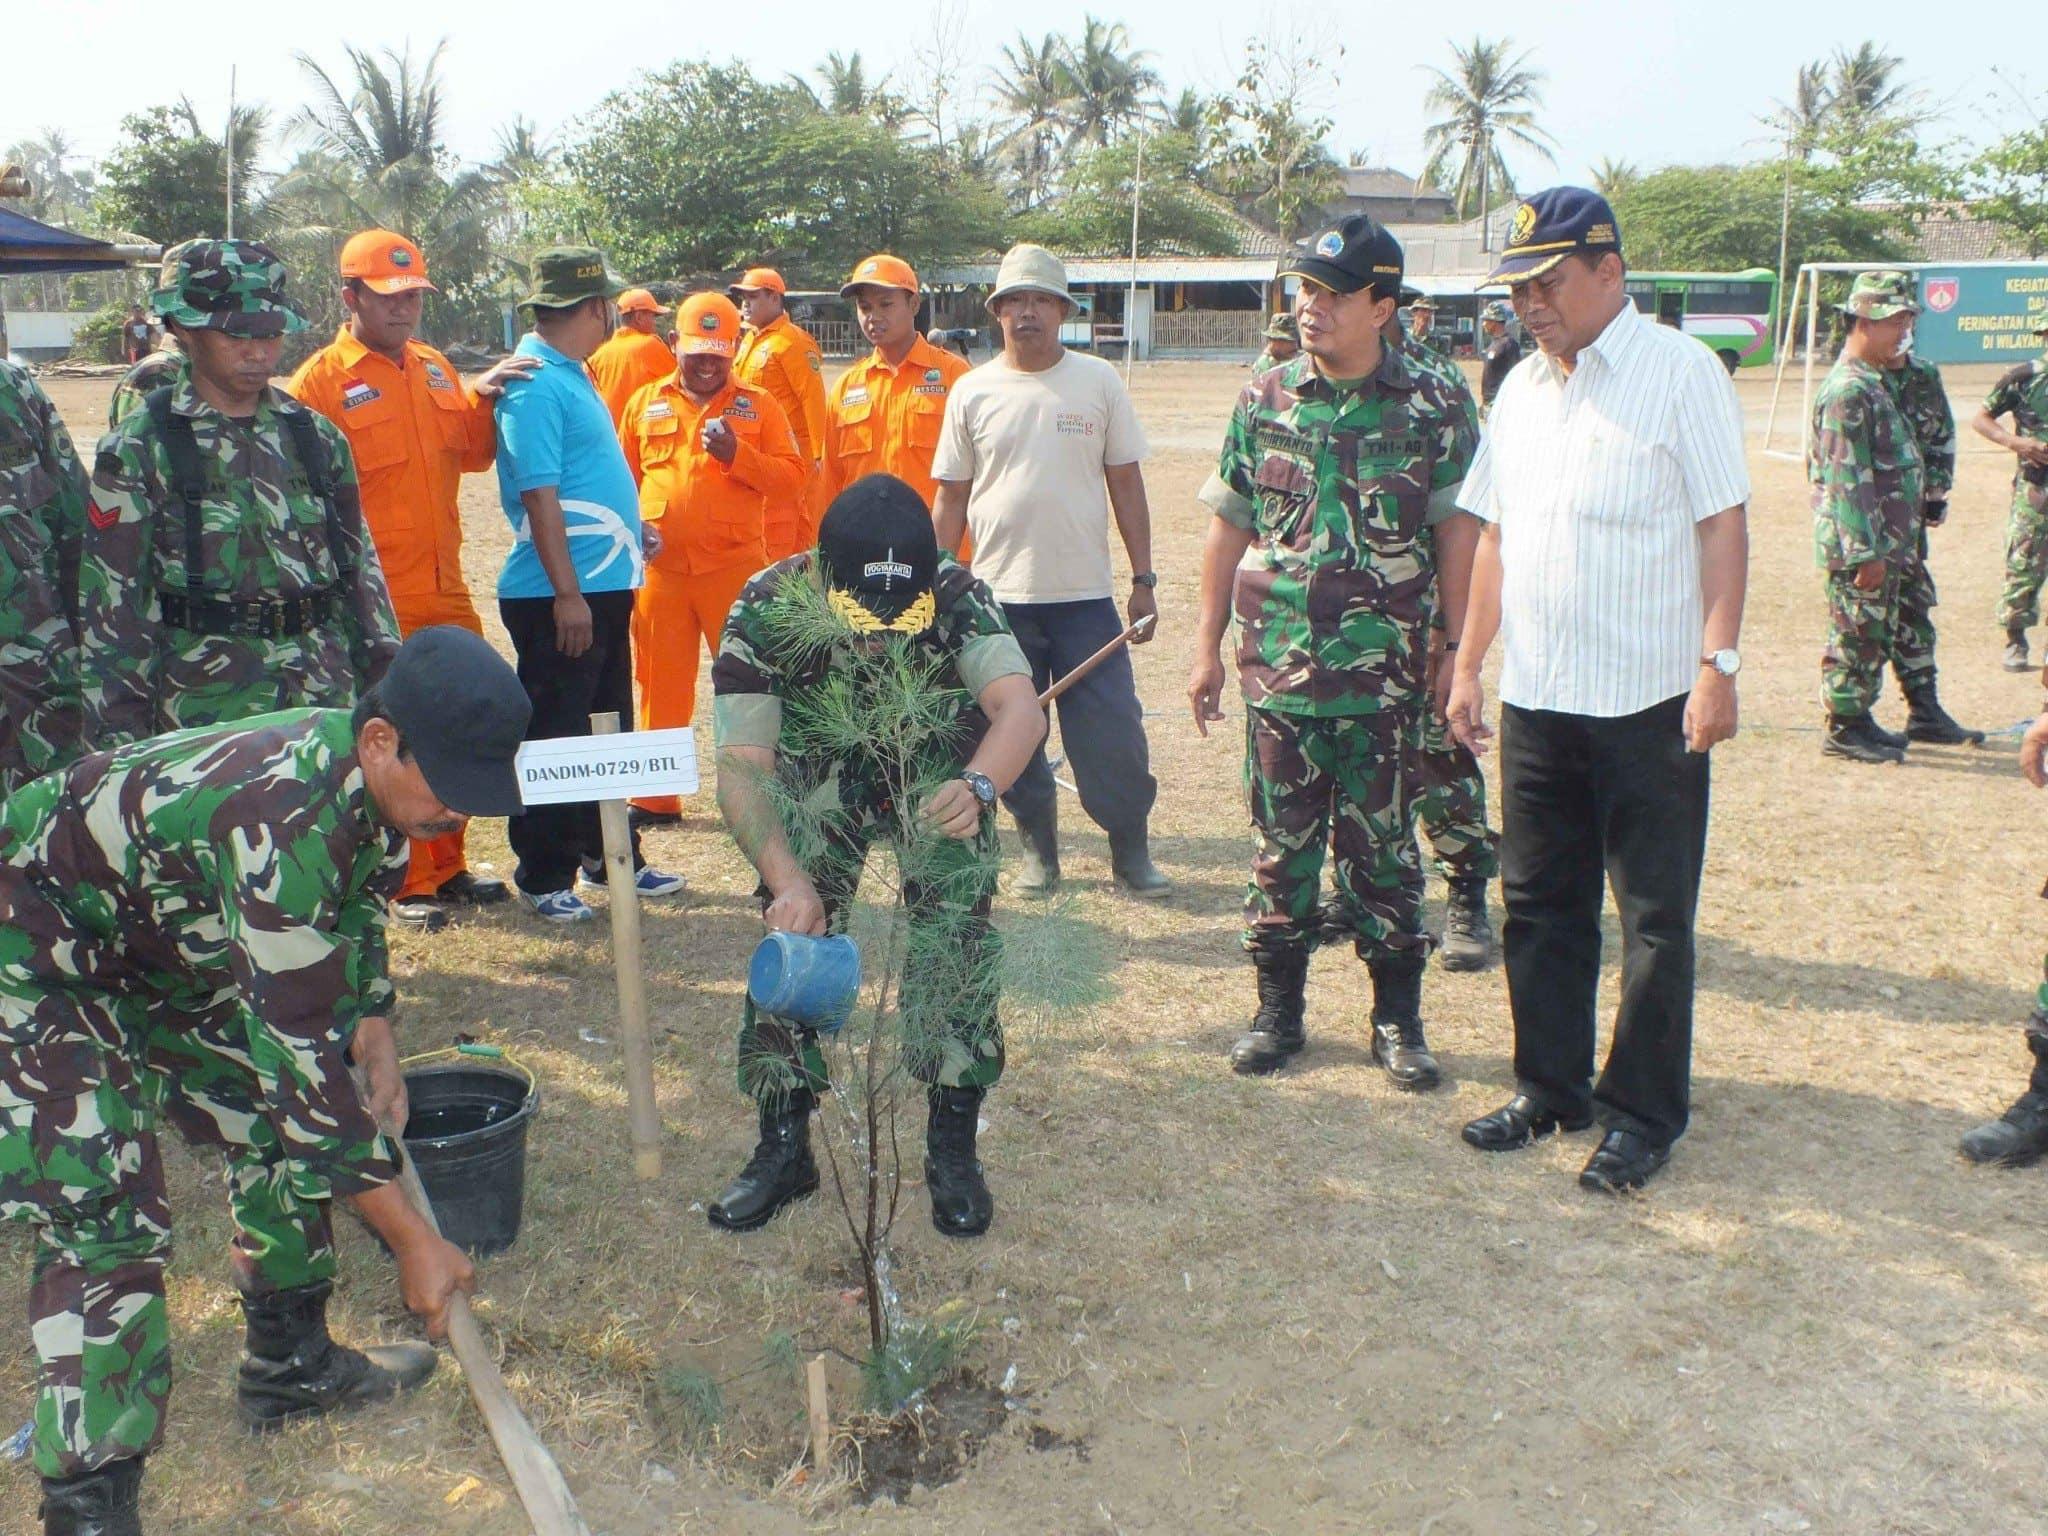 Kodim Bantul Beserta Masyarakat Tanam Pohon Cemara Udang dan Pohon Nyamplung